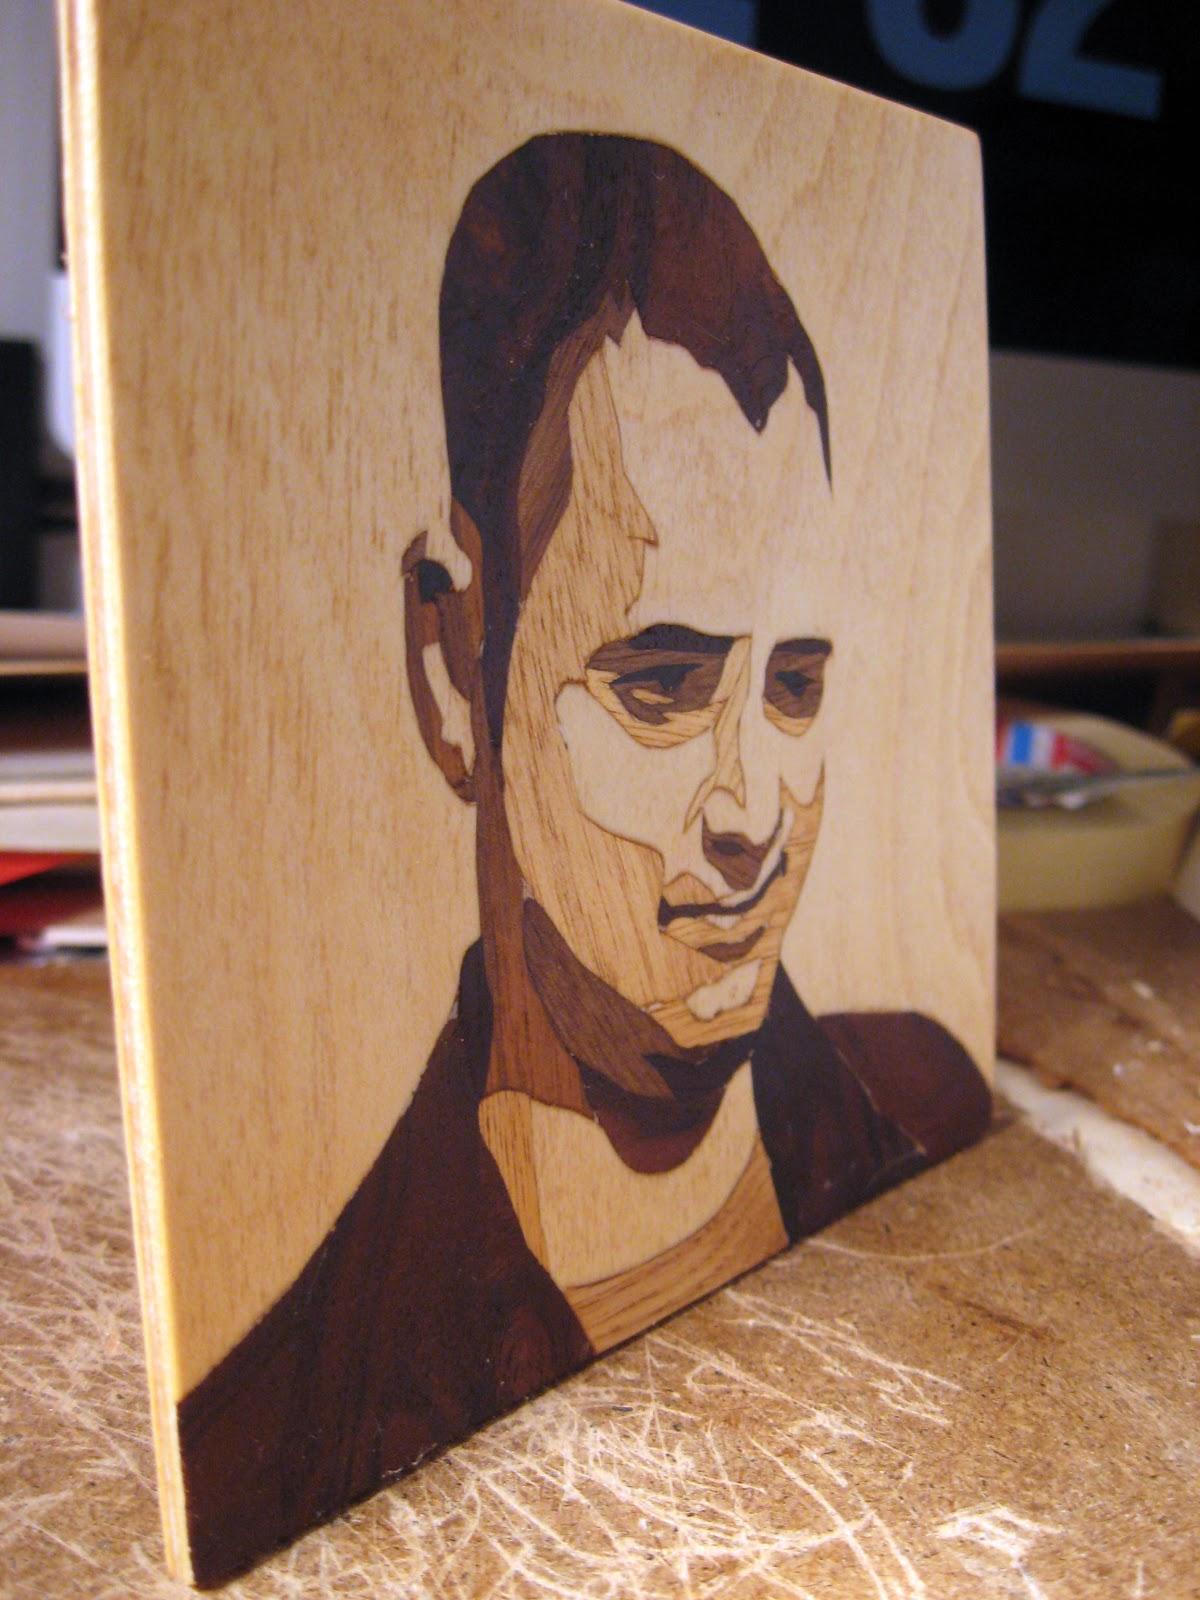 sandor laszlo design: New portrait of the Wood Arts